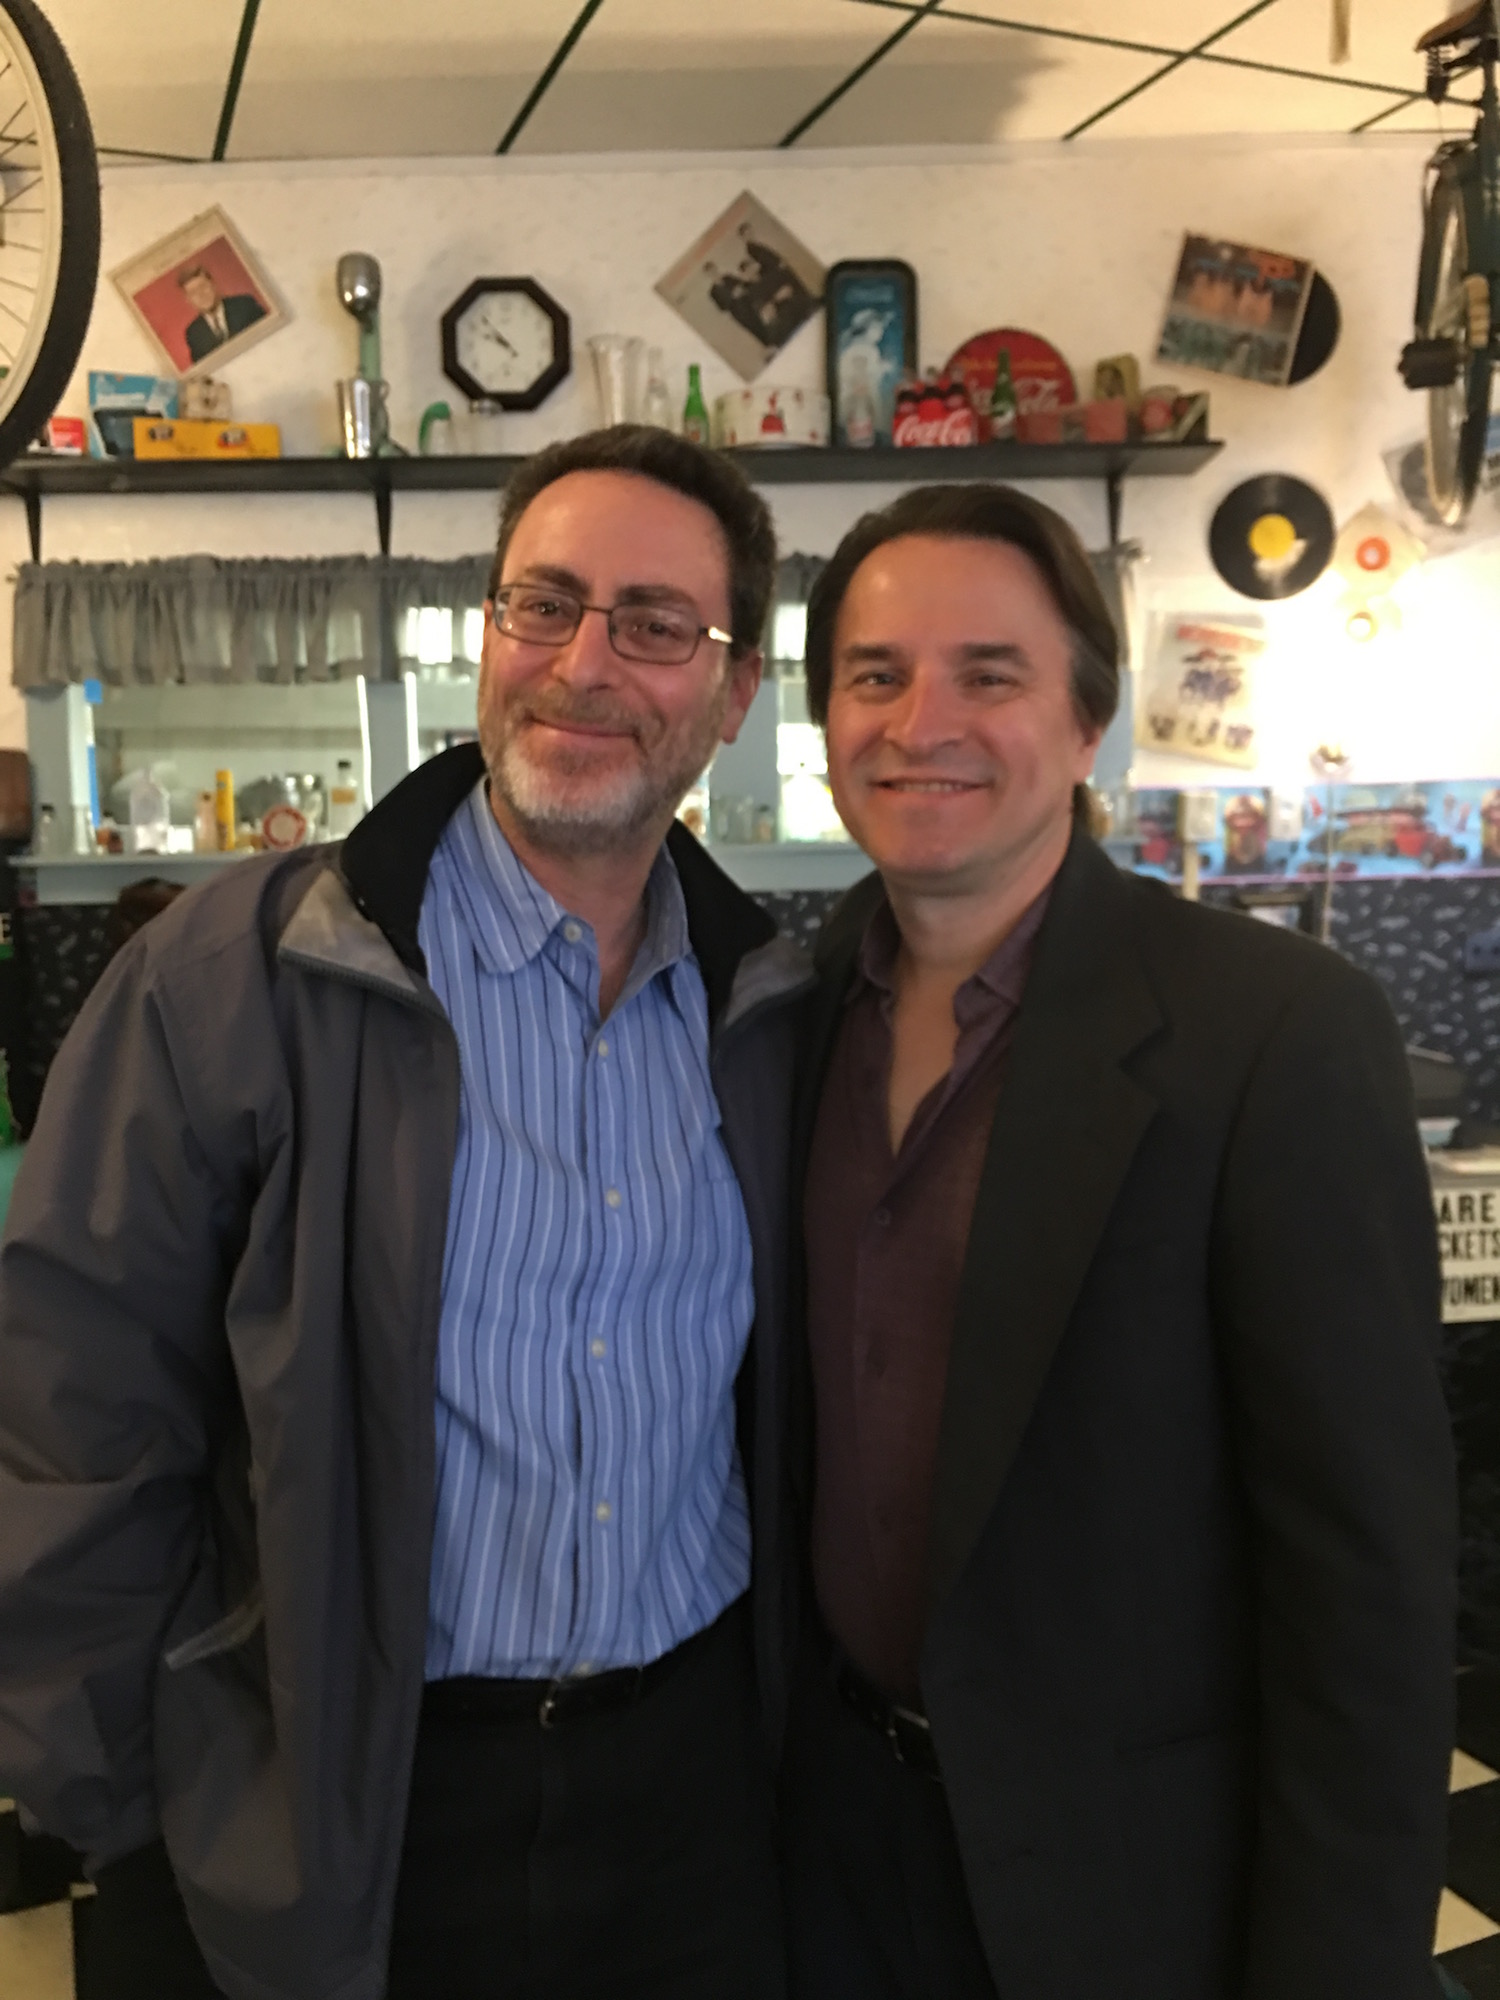 DRG III (right) with Bob Greenberger ©2017 Karen Ragan-George